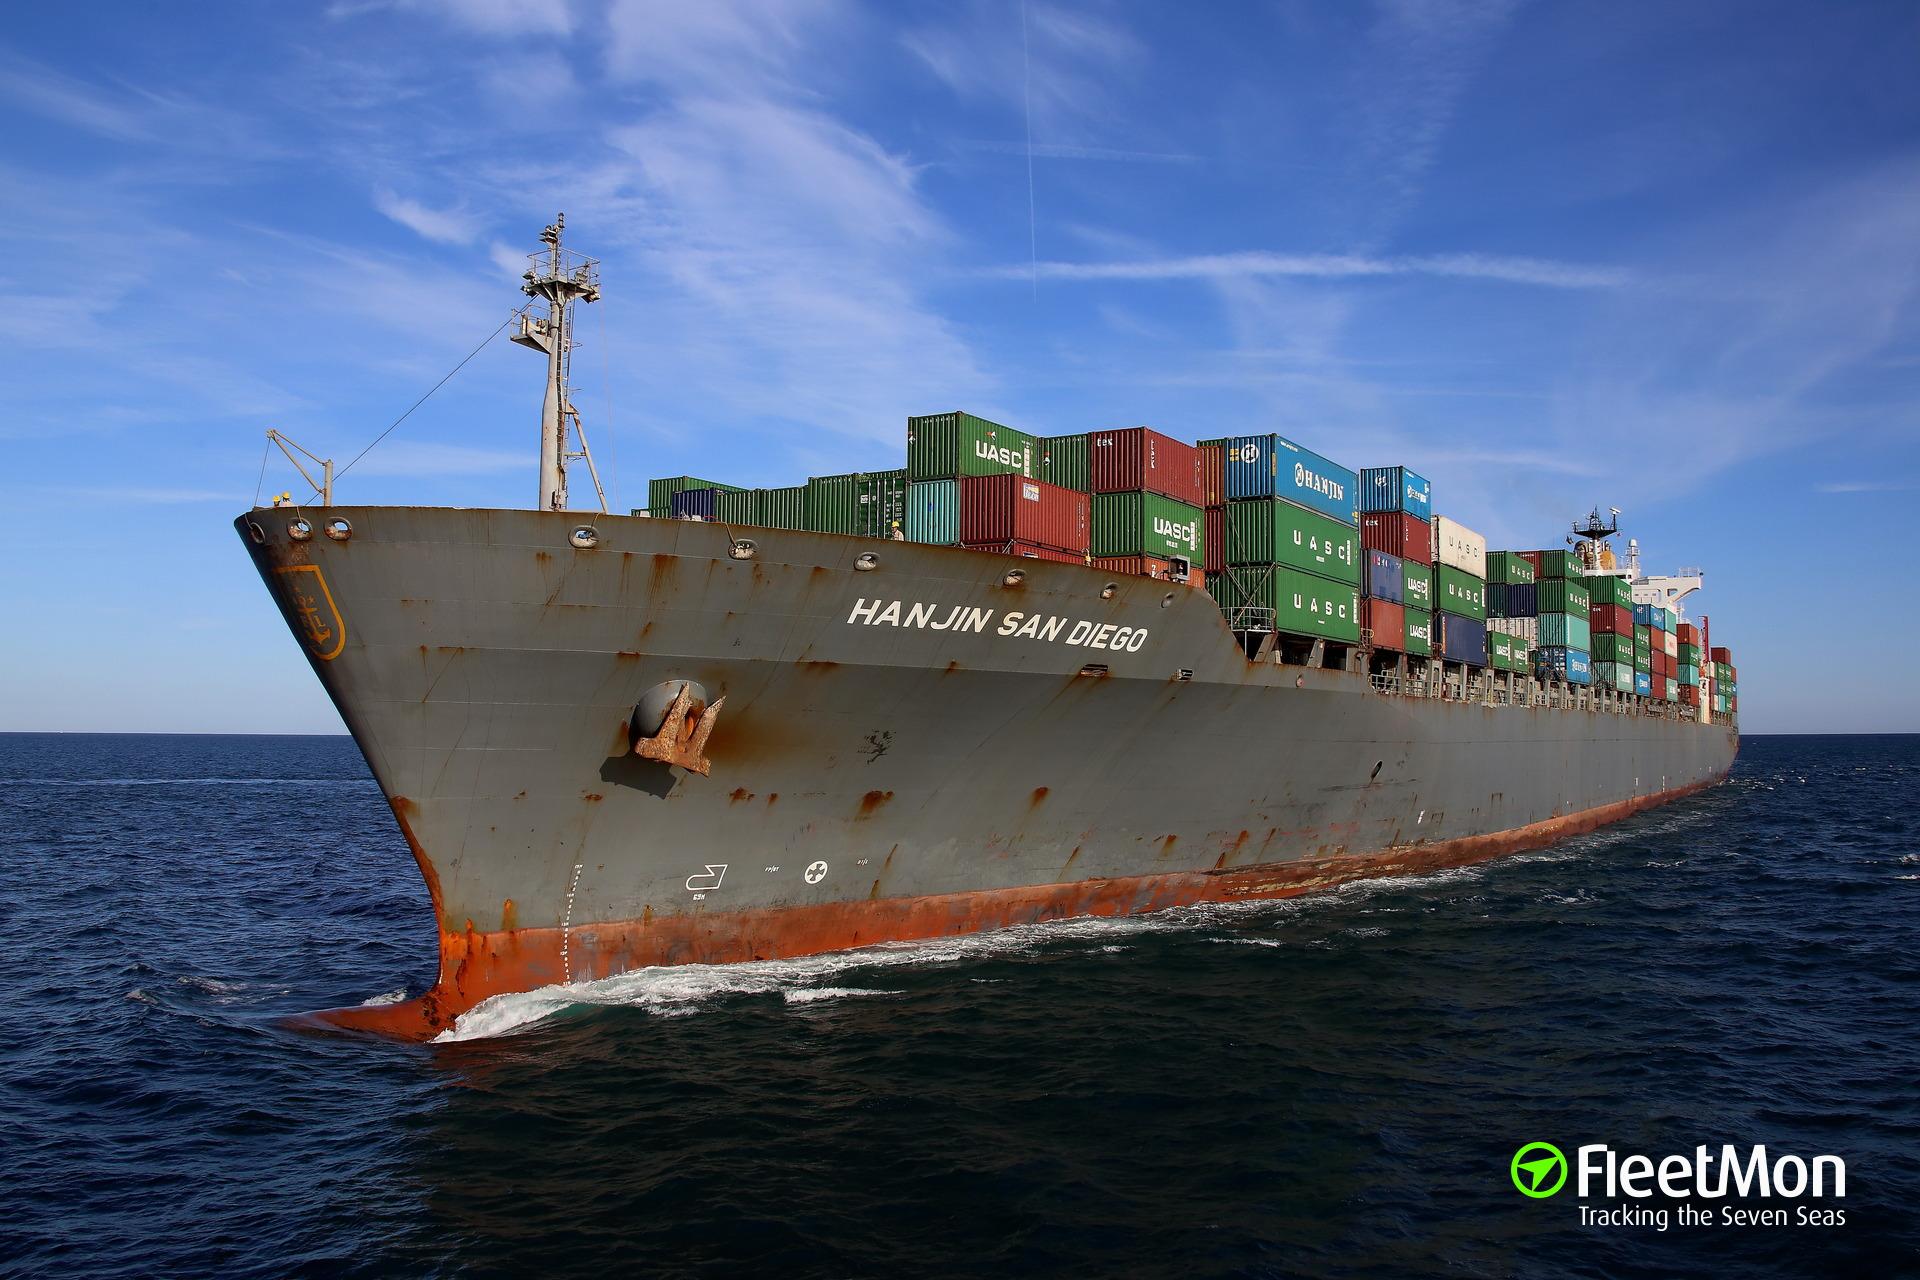 Boxship Hanjin San Diego lost power approaching Wilmington, USA